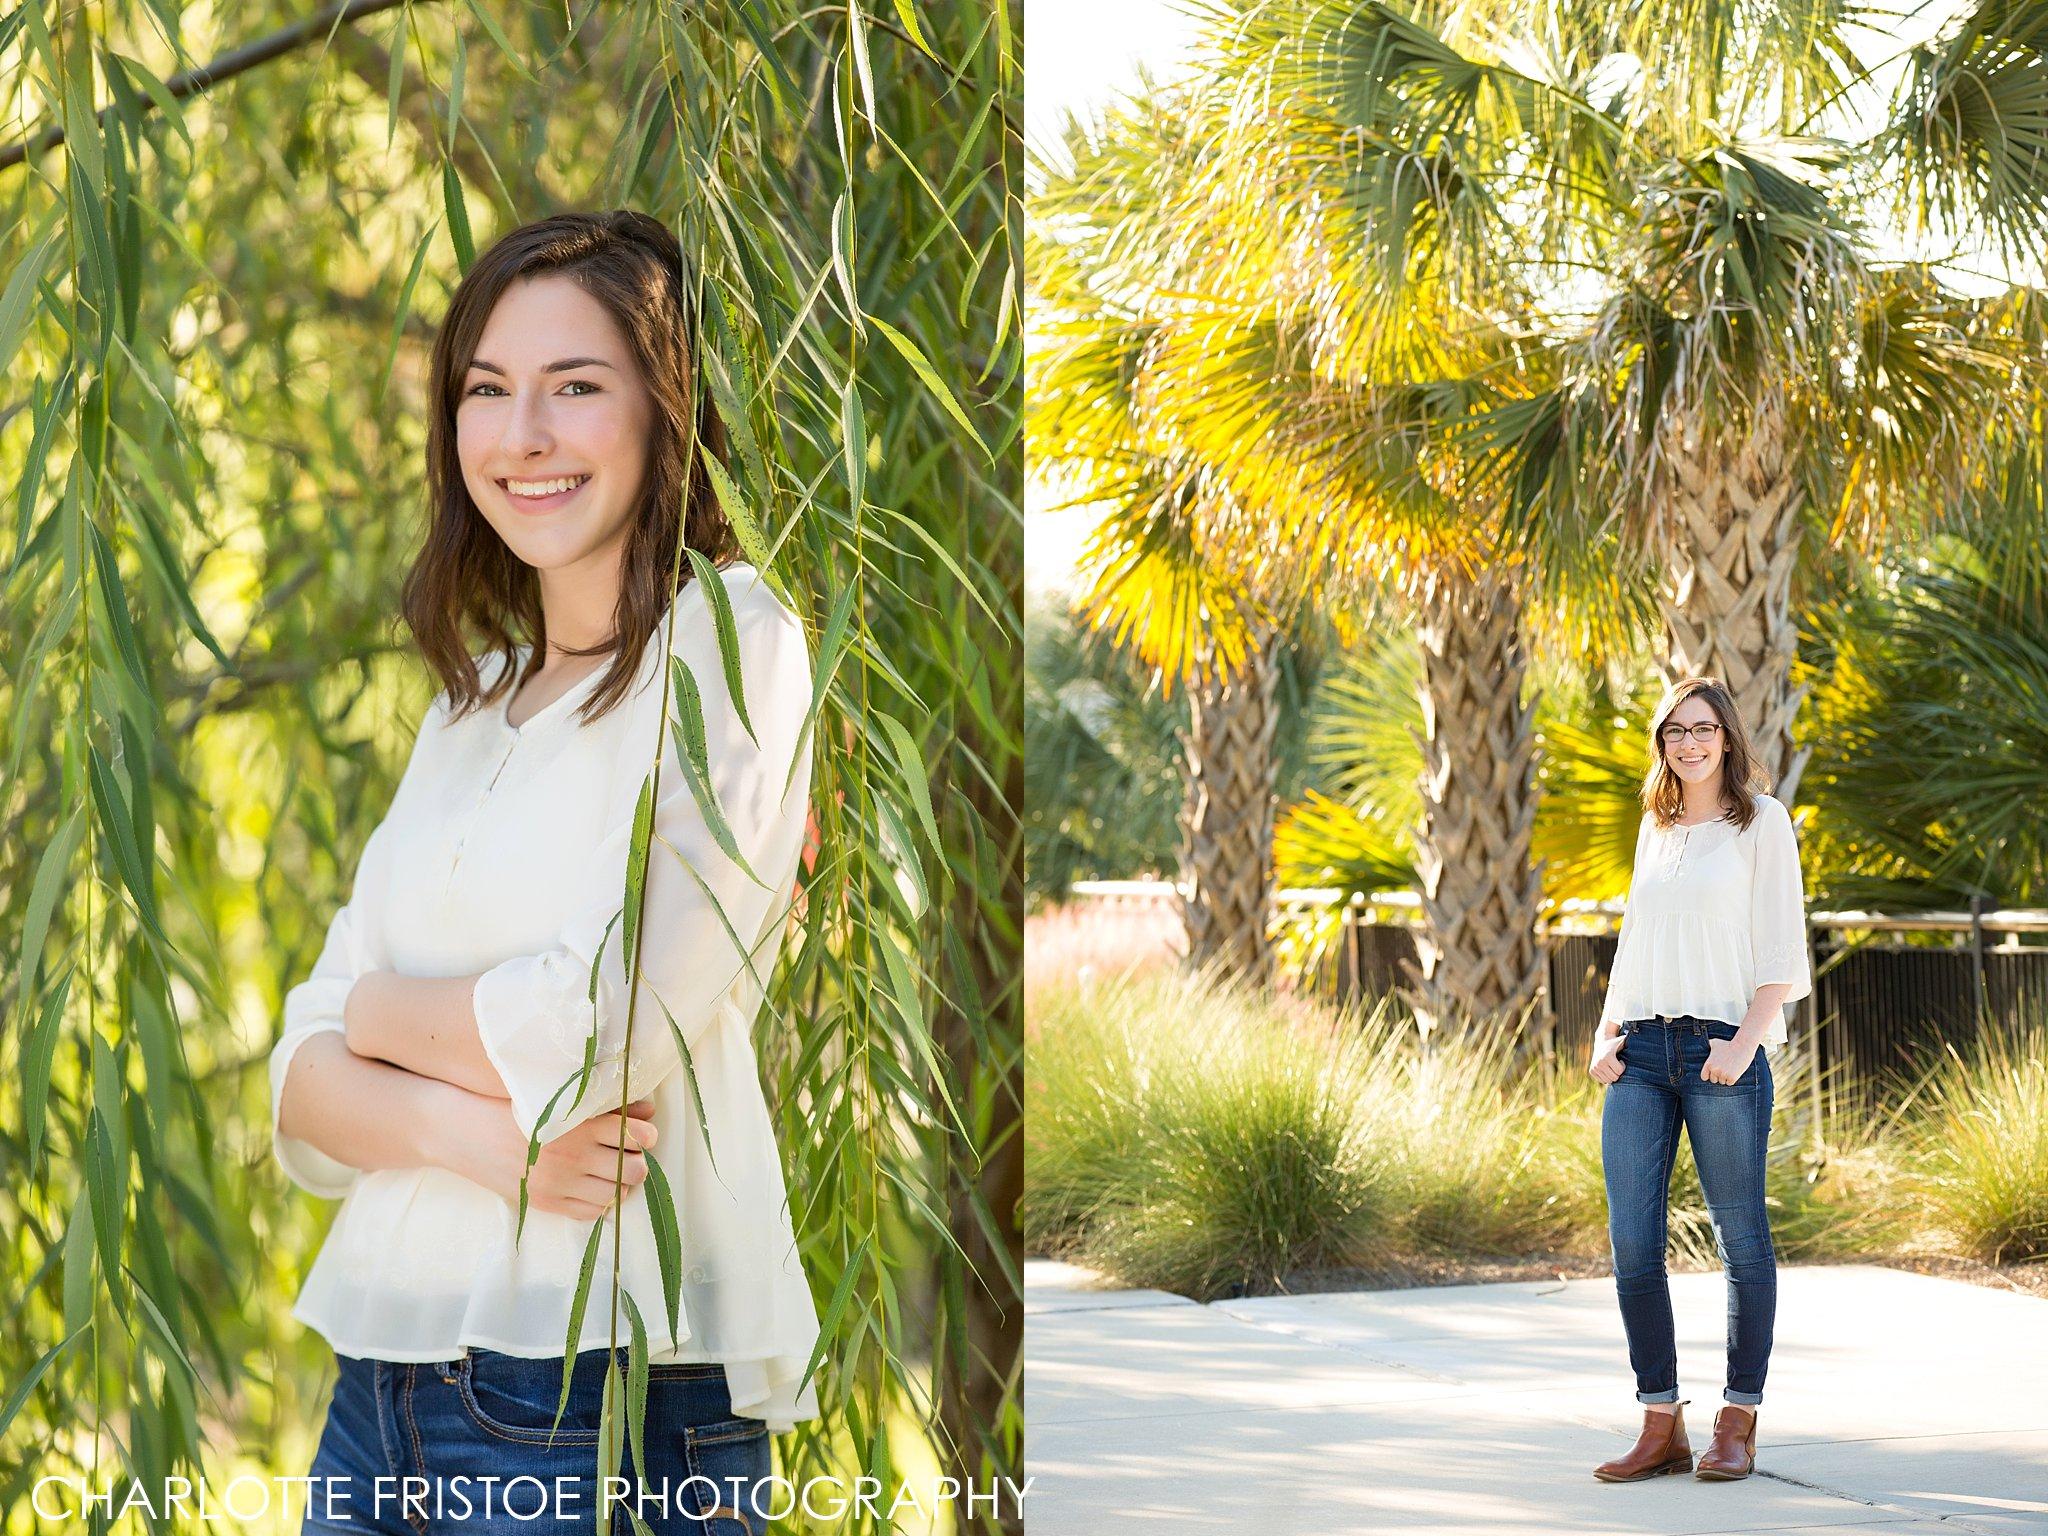 Charlotte Fristoe Photography Senior Pictures-6.jpg